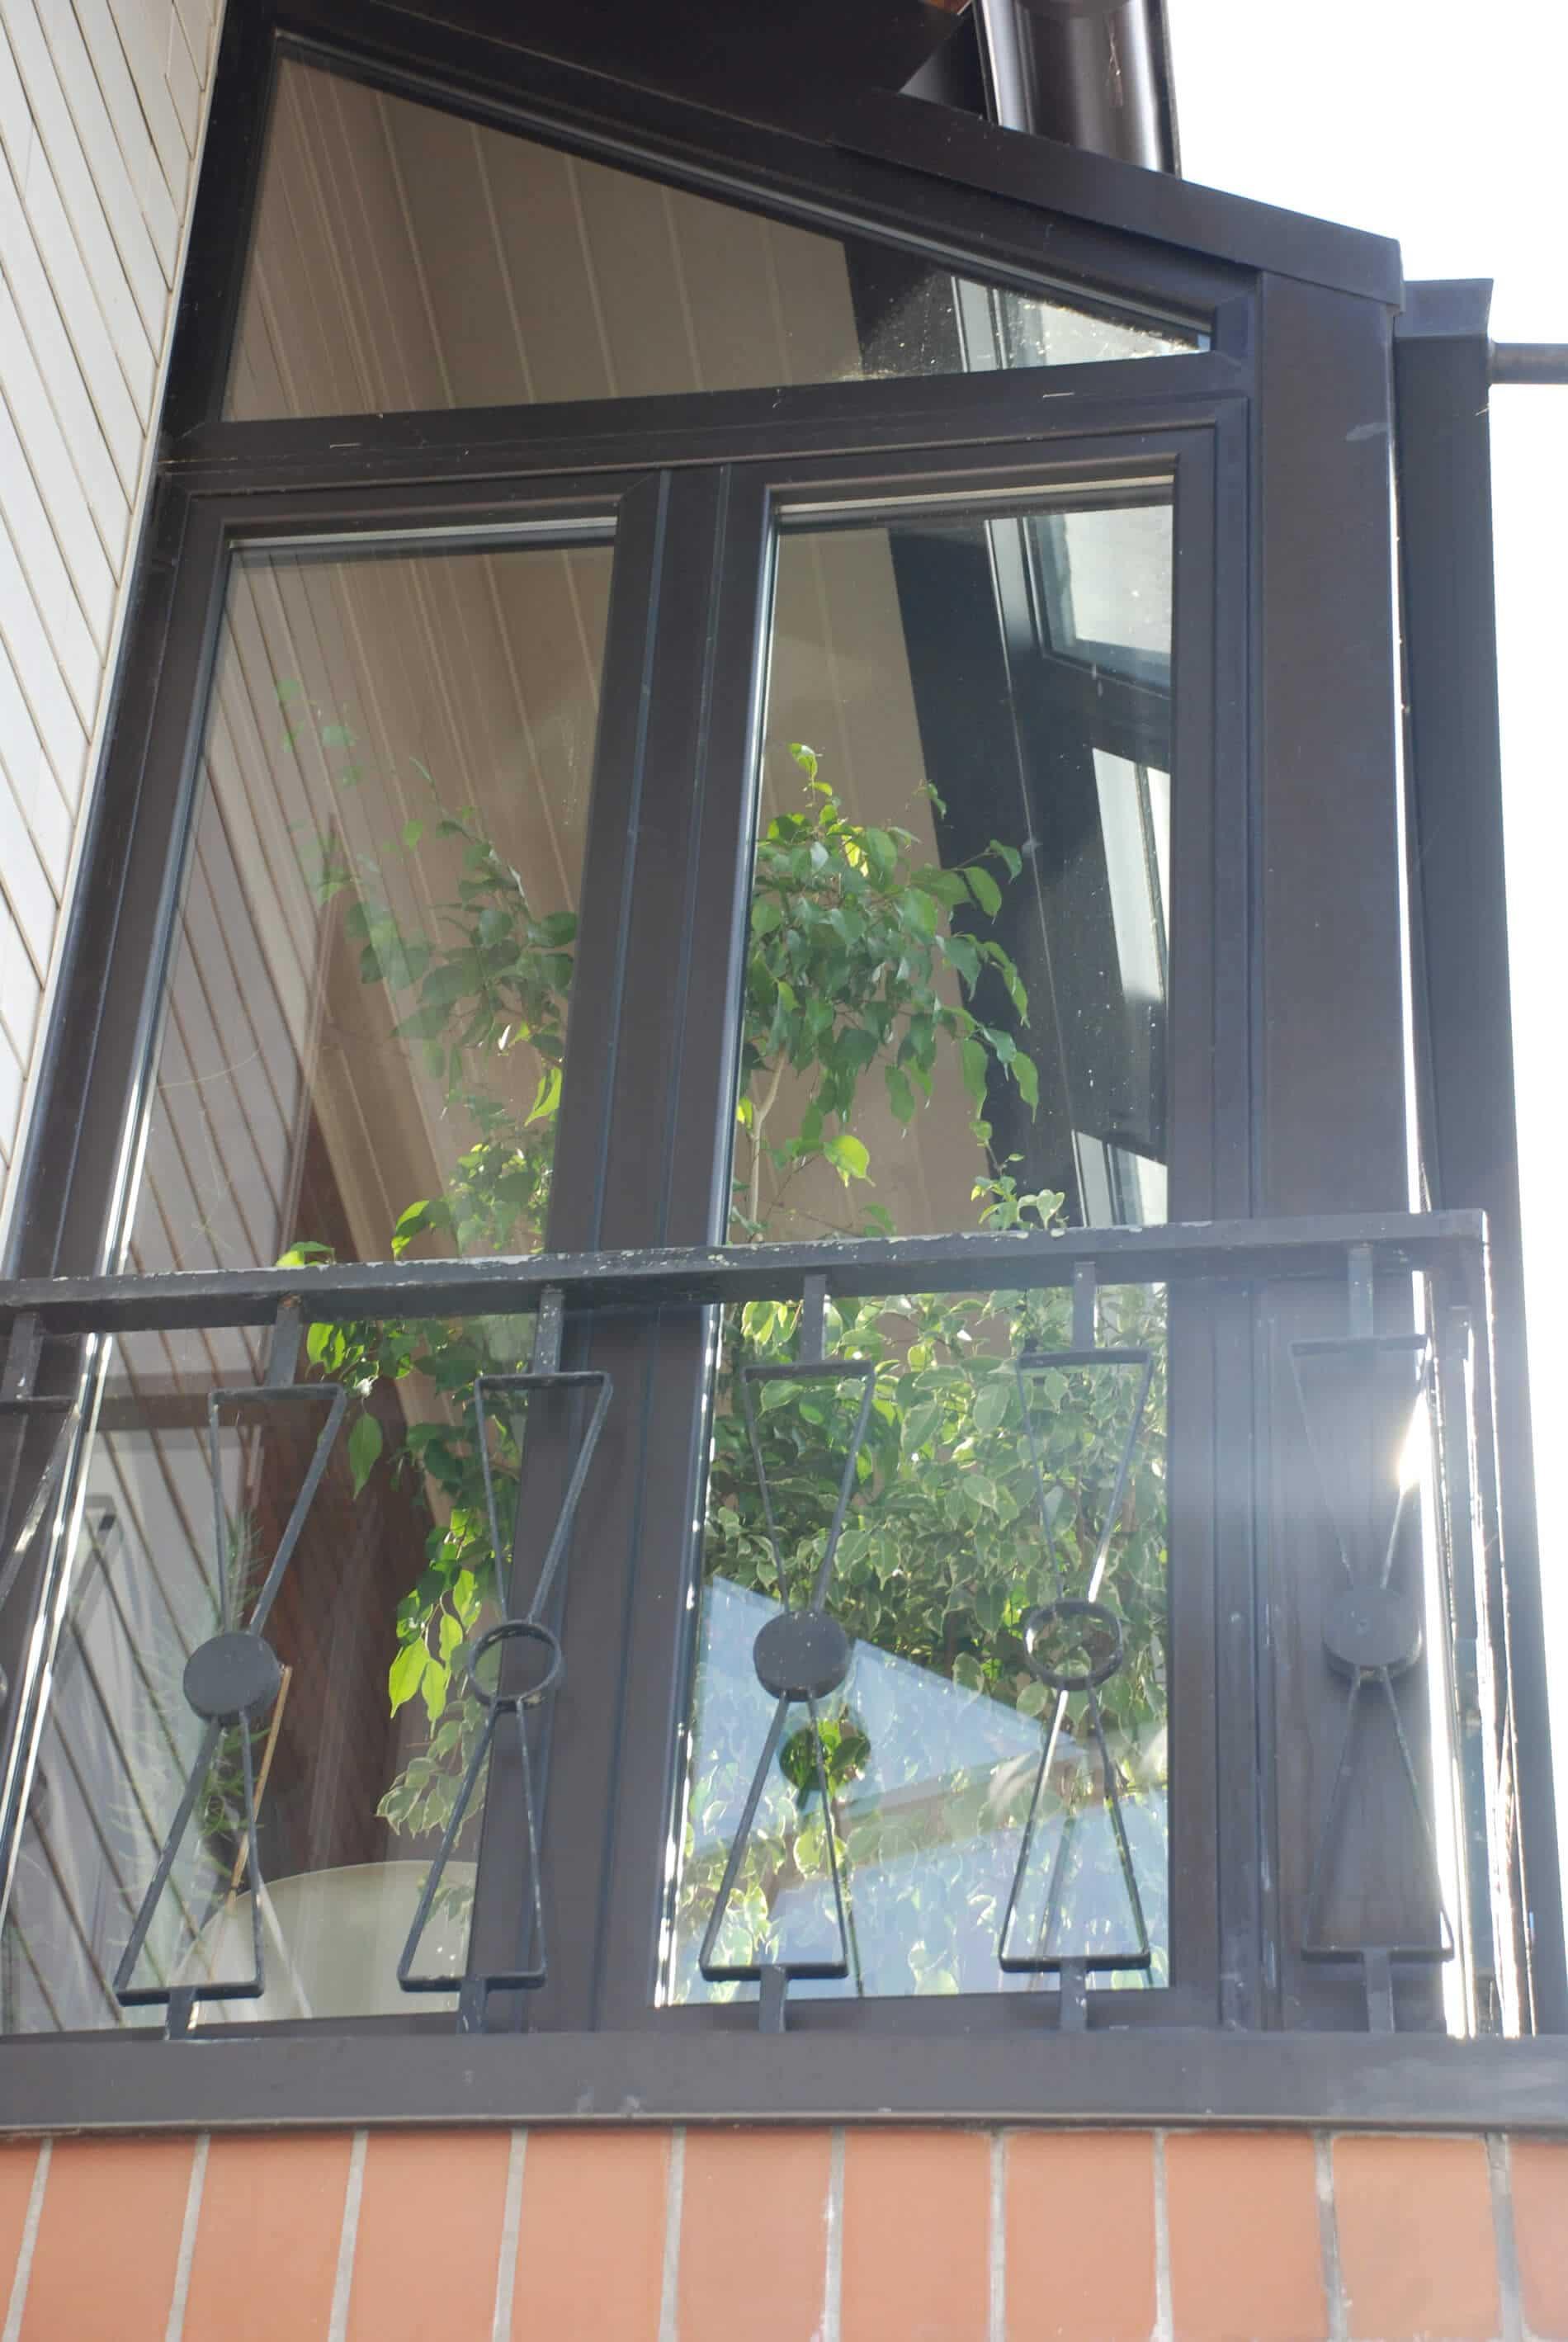 Wintergarten auf Balkon - Wärmeschutzglas - Farbe dunkelbraun